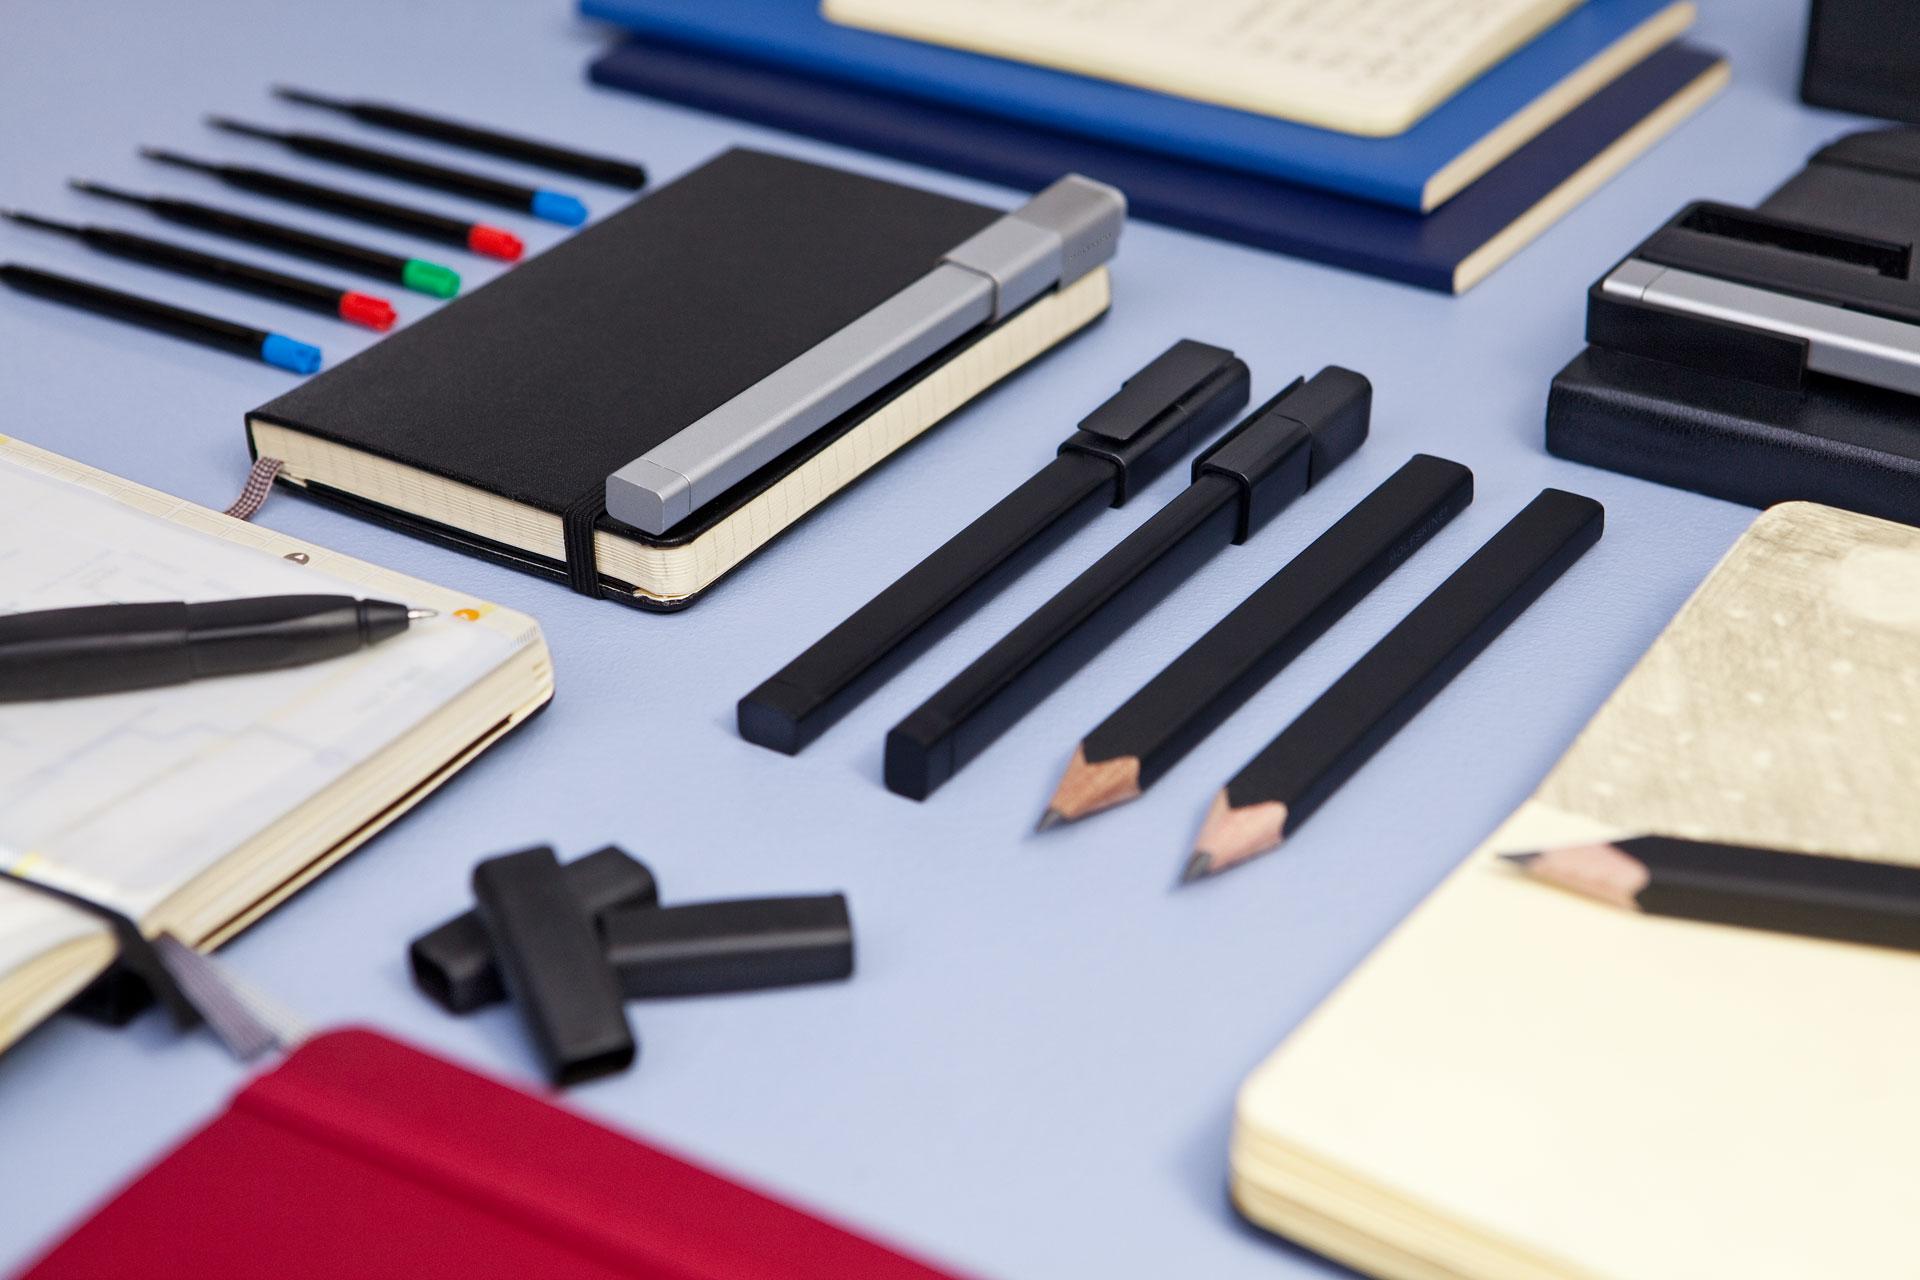 Moleskine Product Design | Inspirational Geek